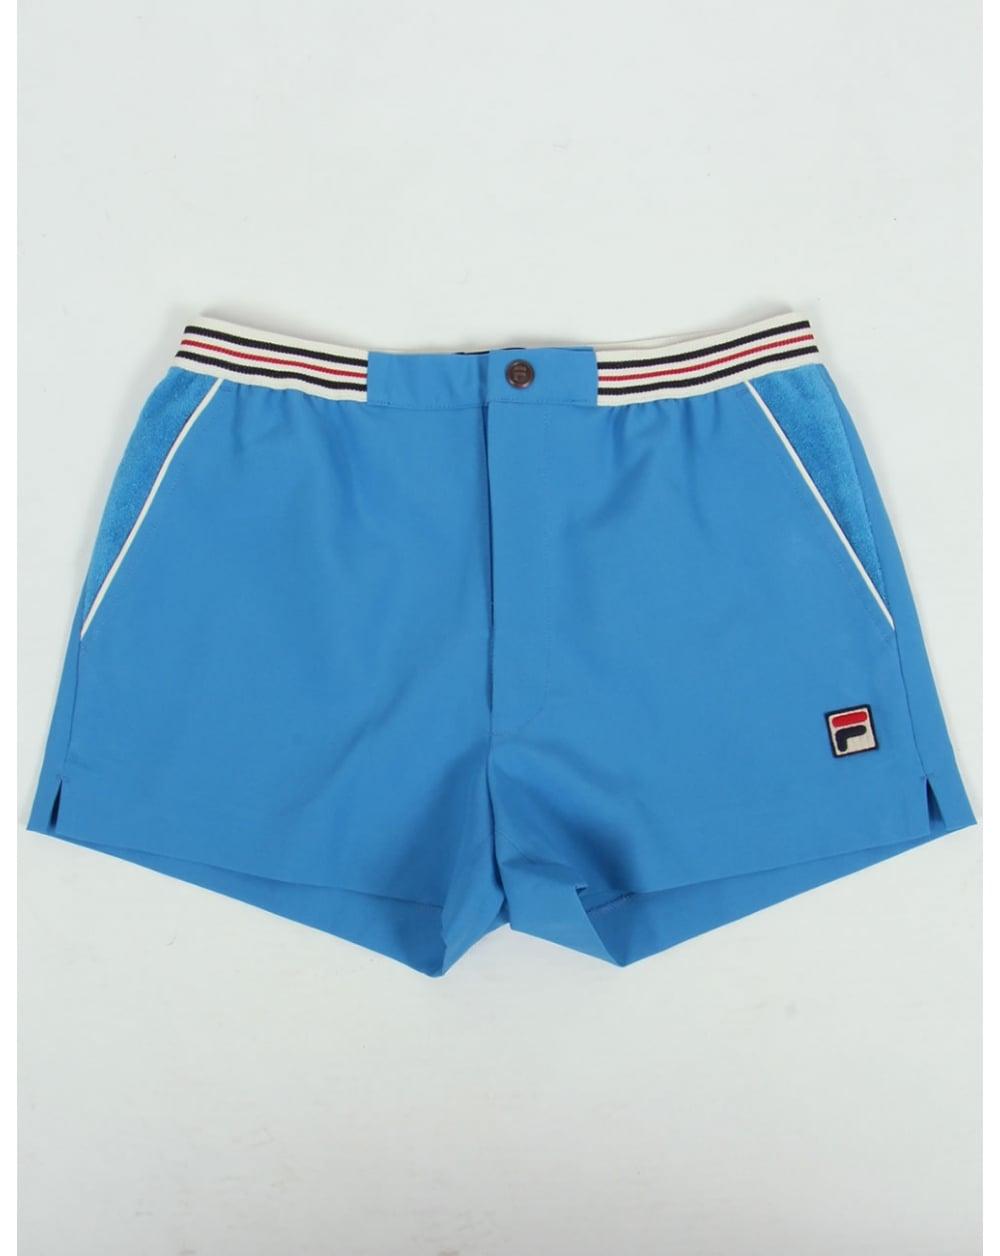 fila vintage shorts